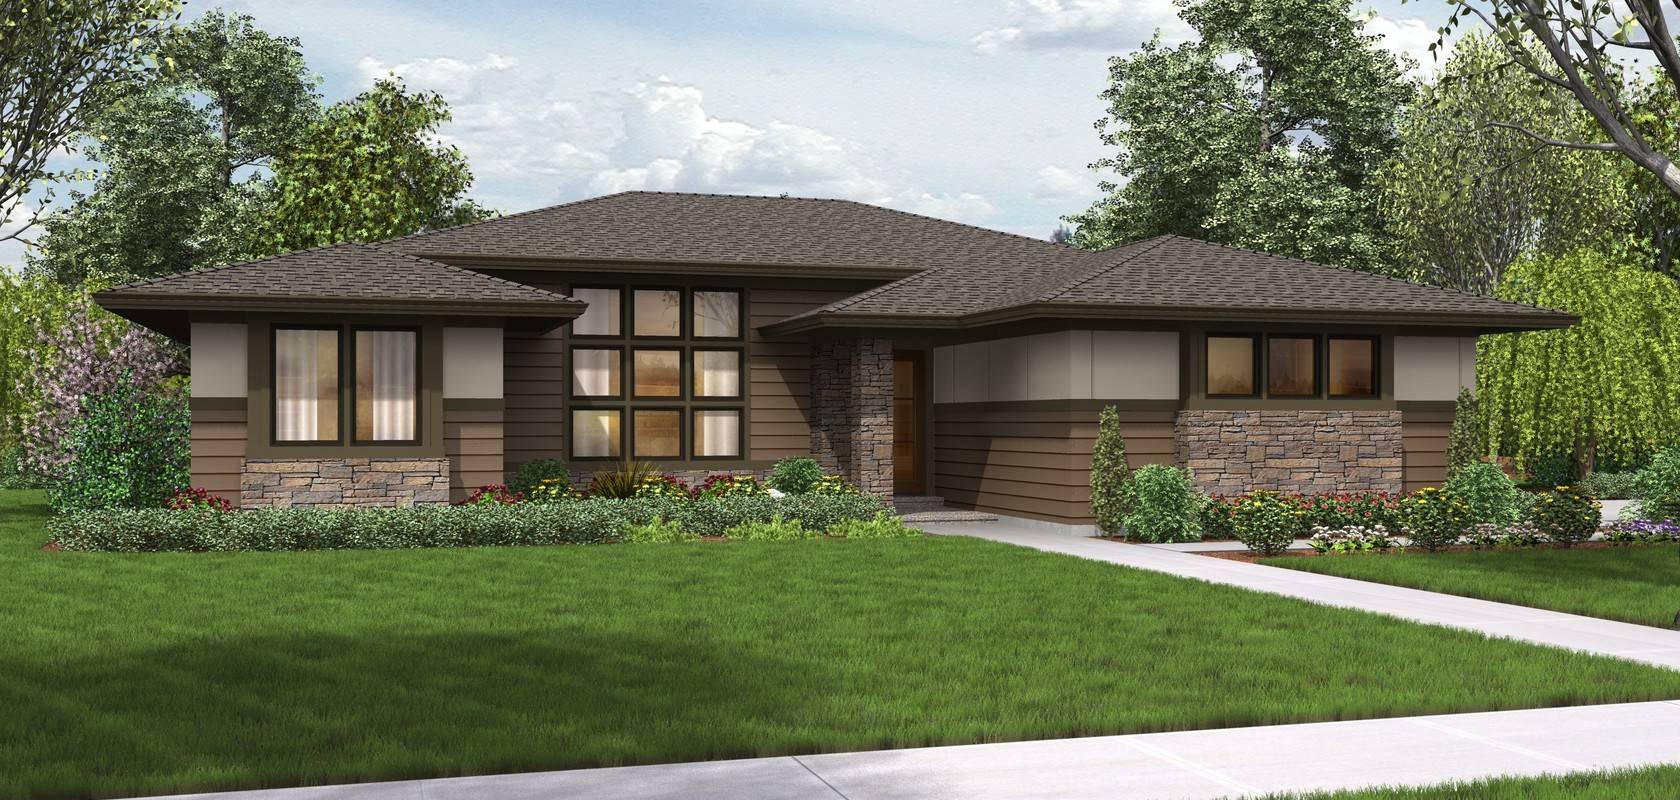 Best Ranch House Plans Ever Escortsea